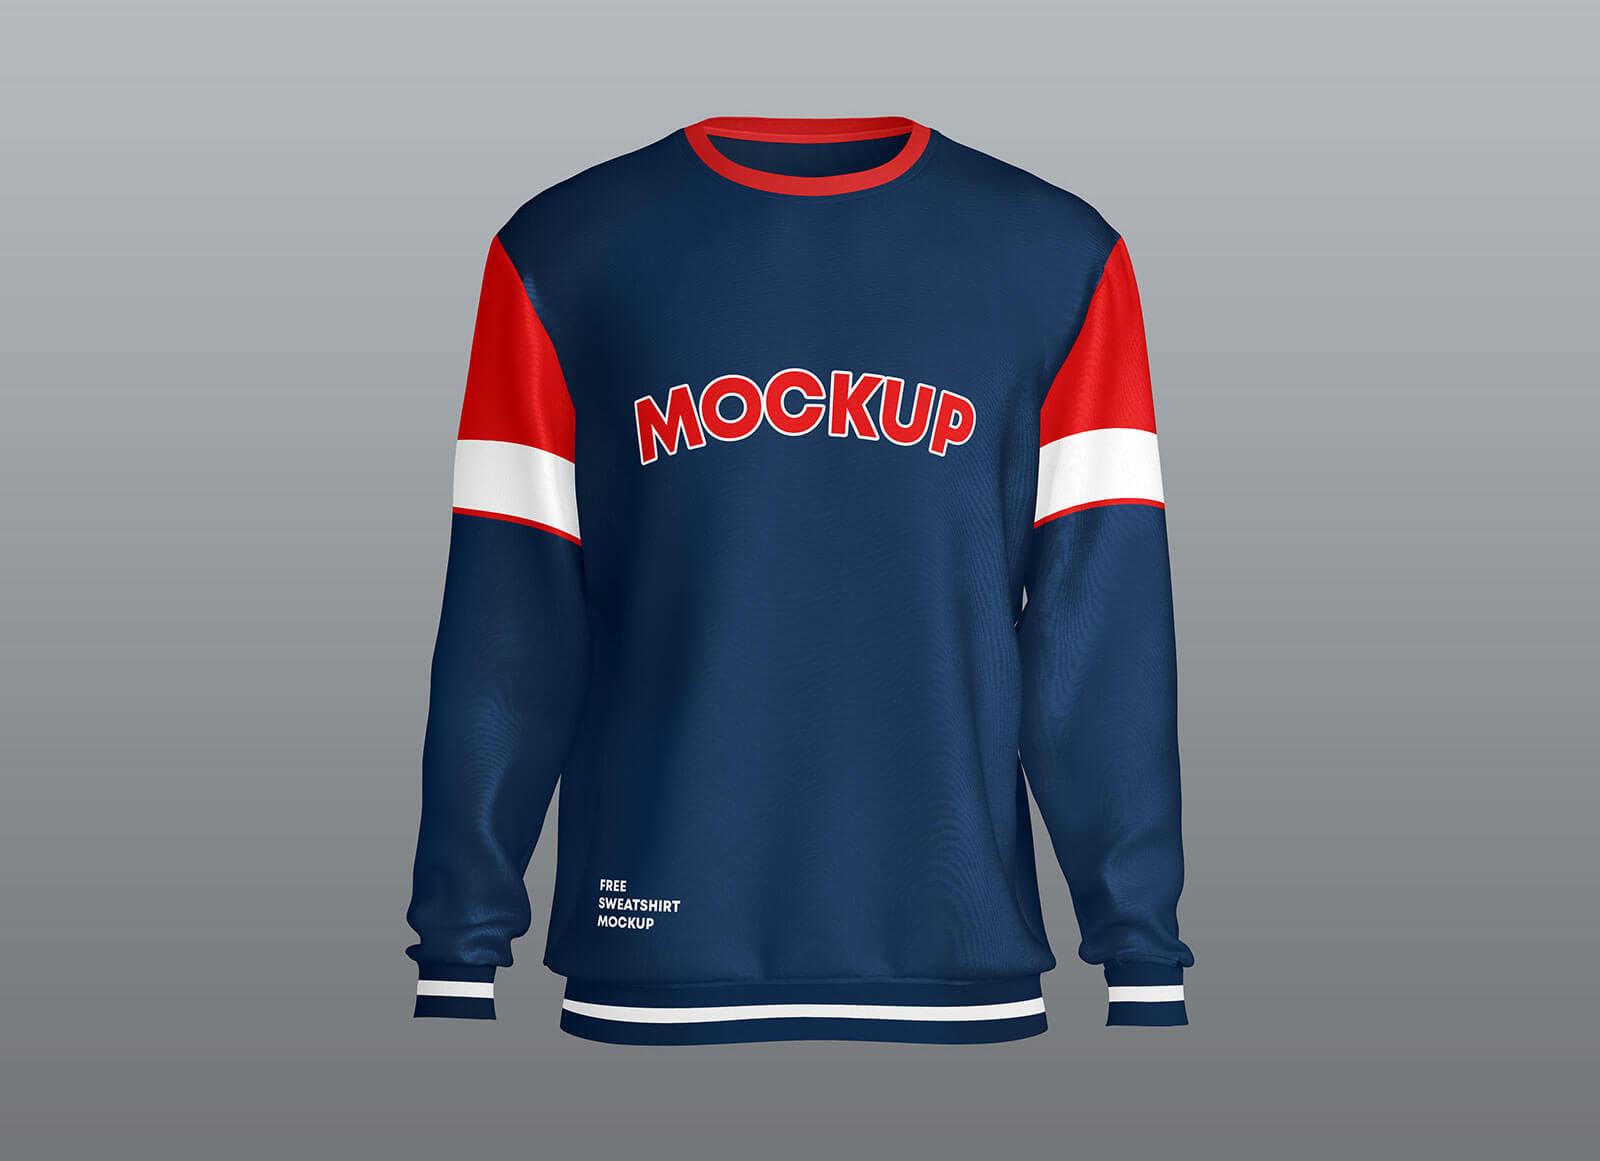 Free-Crew-Neck-Full-Sleeves-Sweatshirt-Mockup-PSD-Set